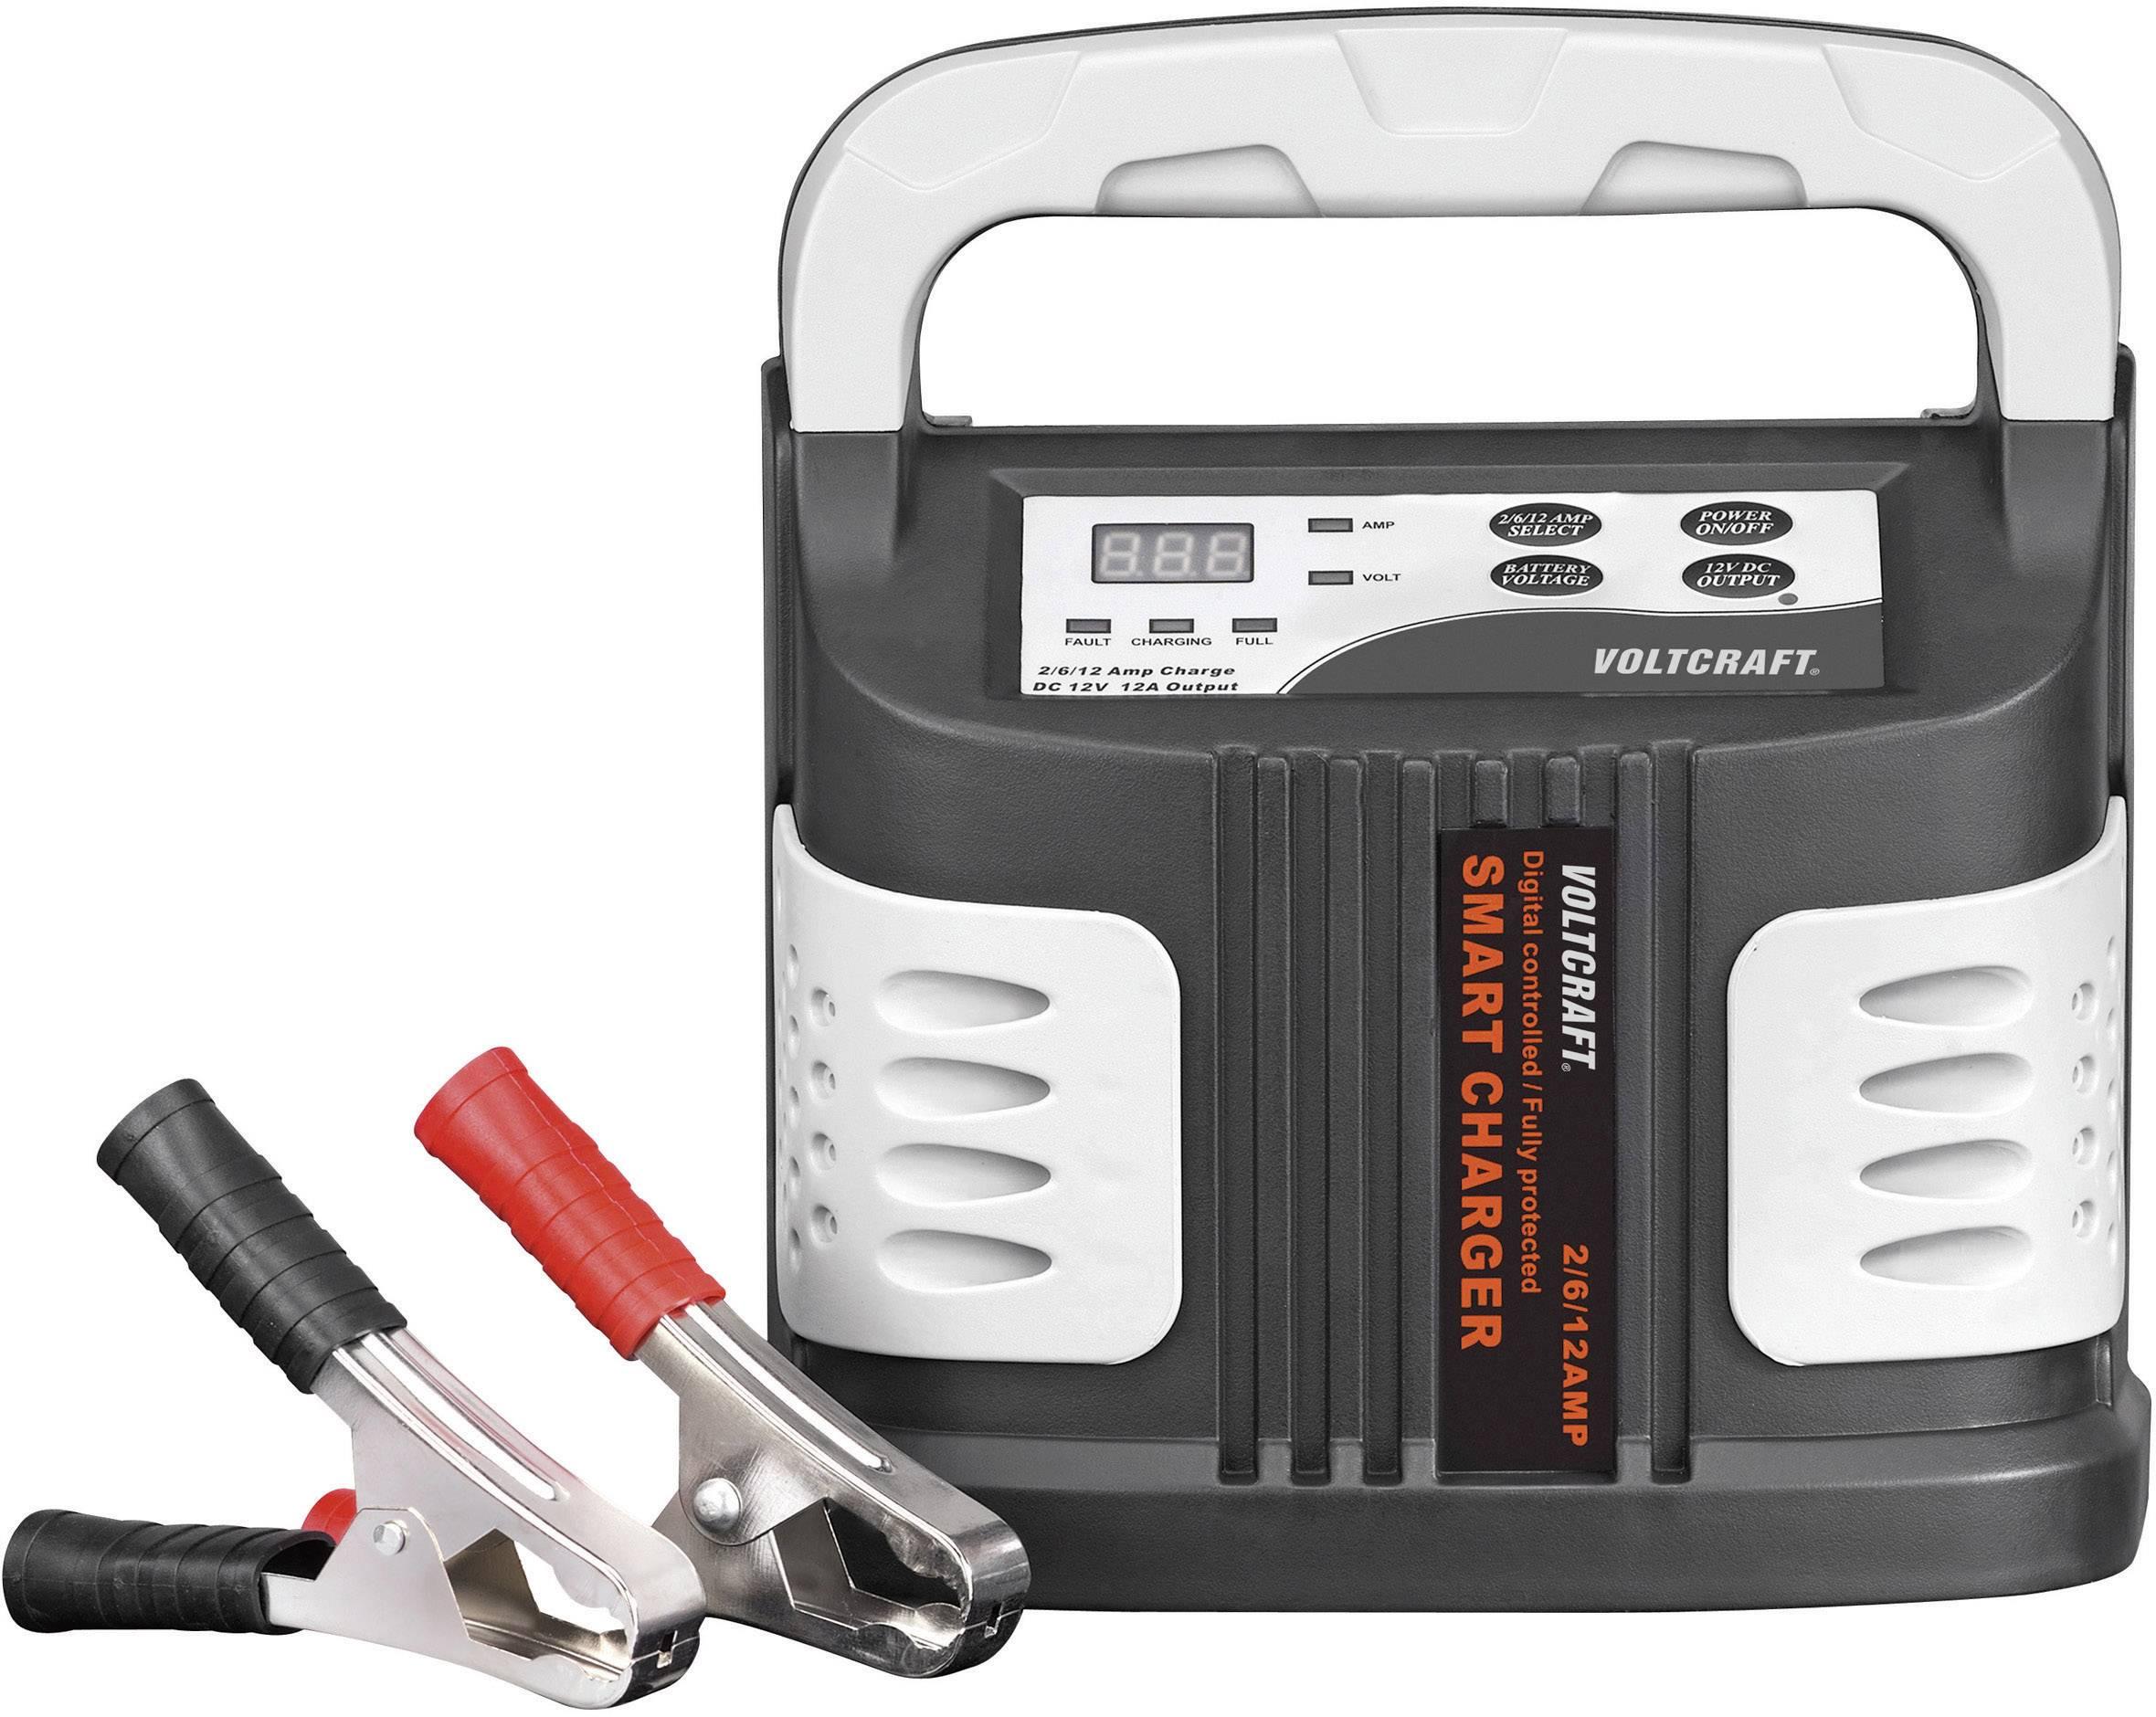 Nabíjačky auto batérií, údržba batérií